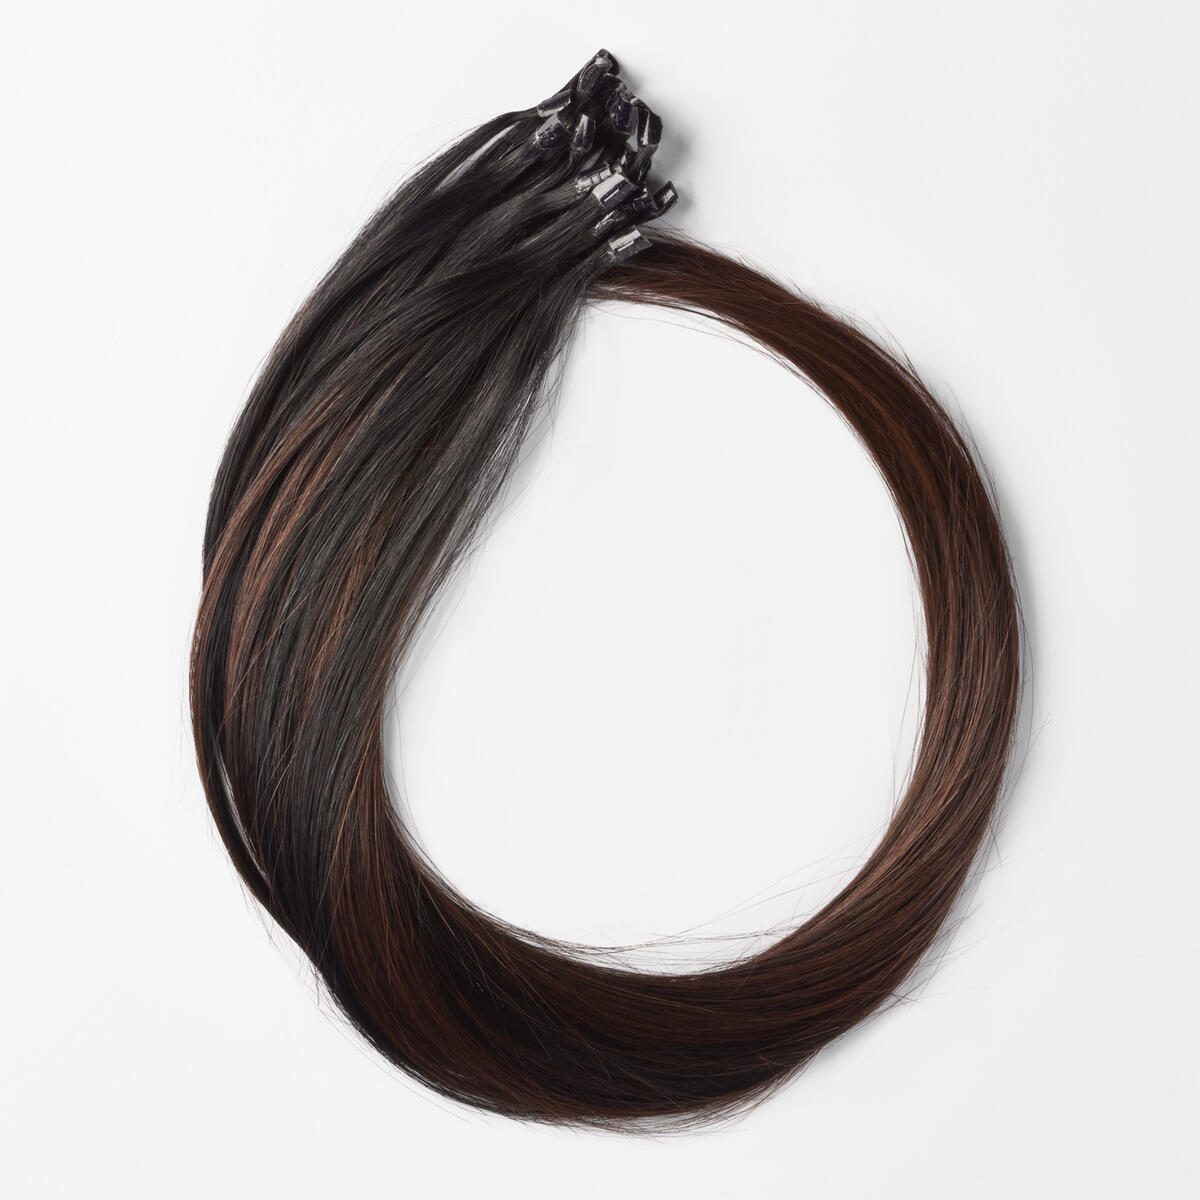 Bondings Premium Glatt B1.0/6.12 Cherry Infused Black Balayage 50 cm